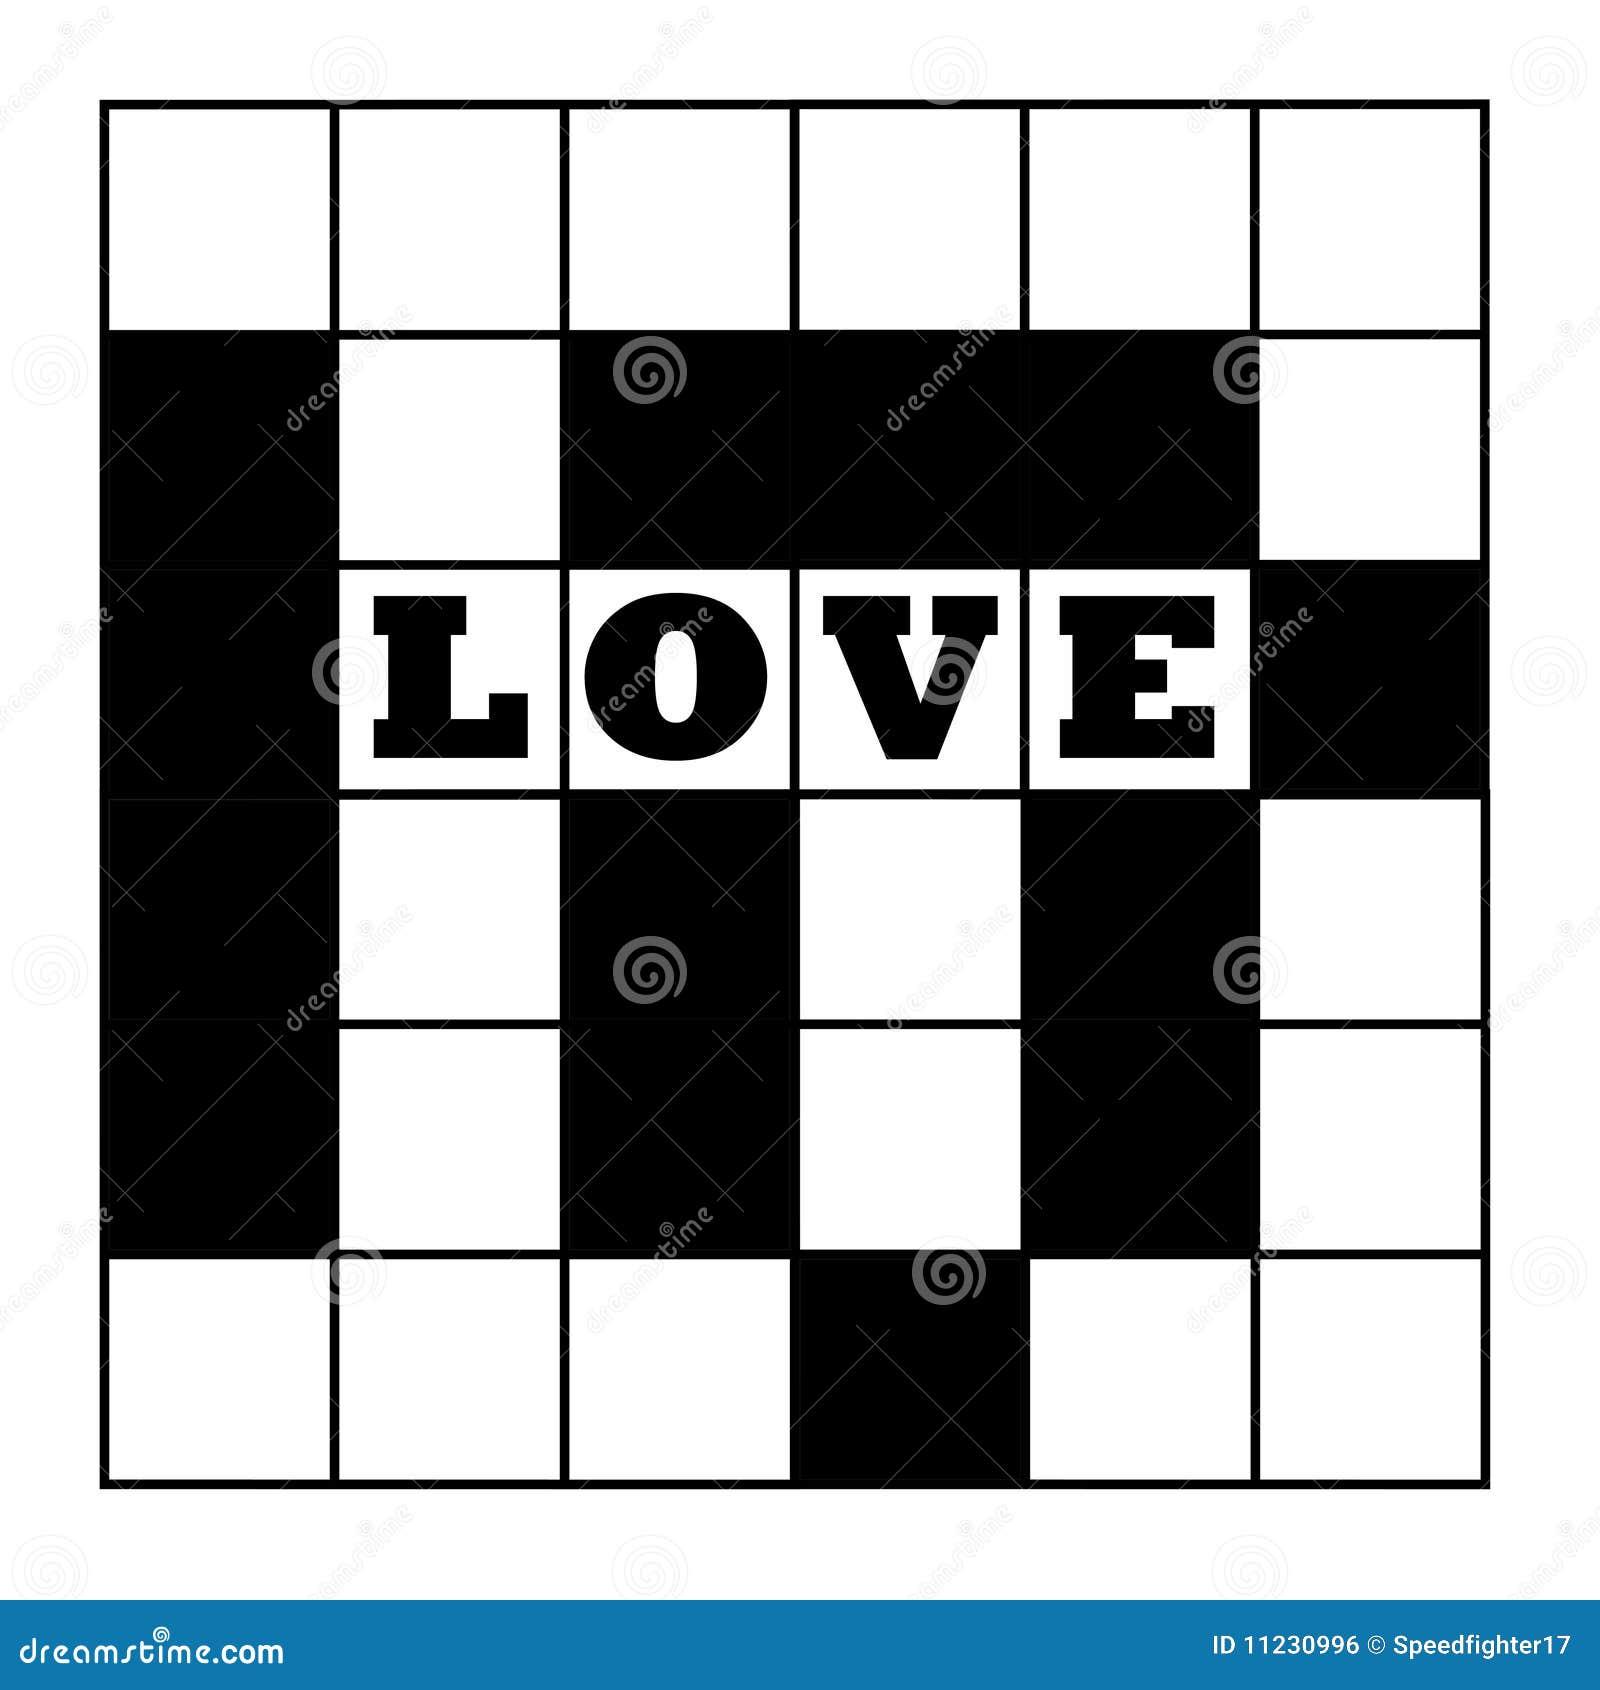 love crossword puzzle stock illustration  illustration of